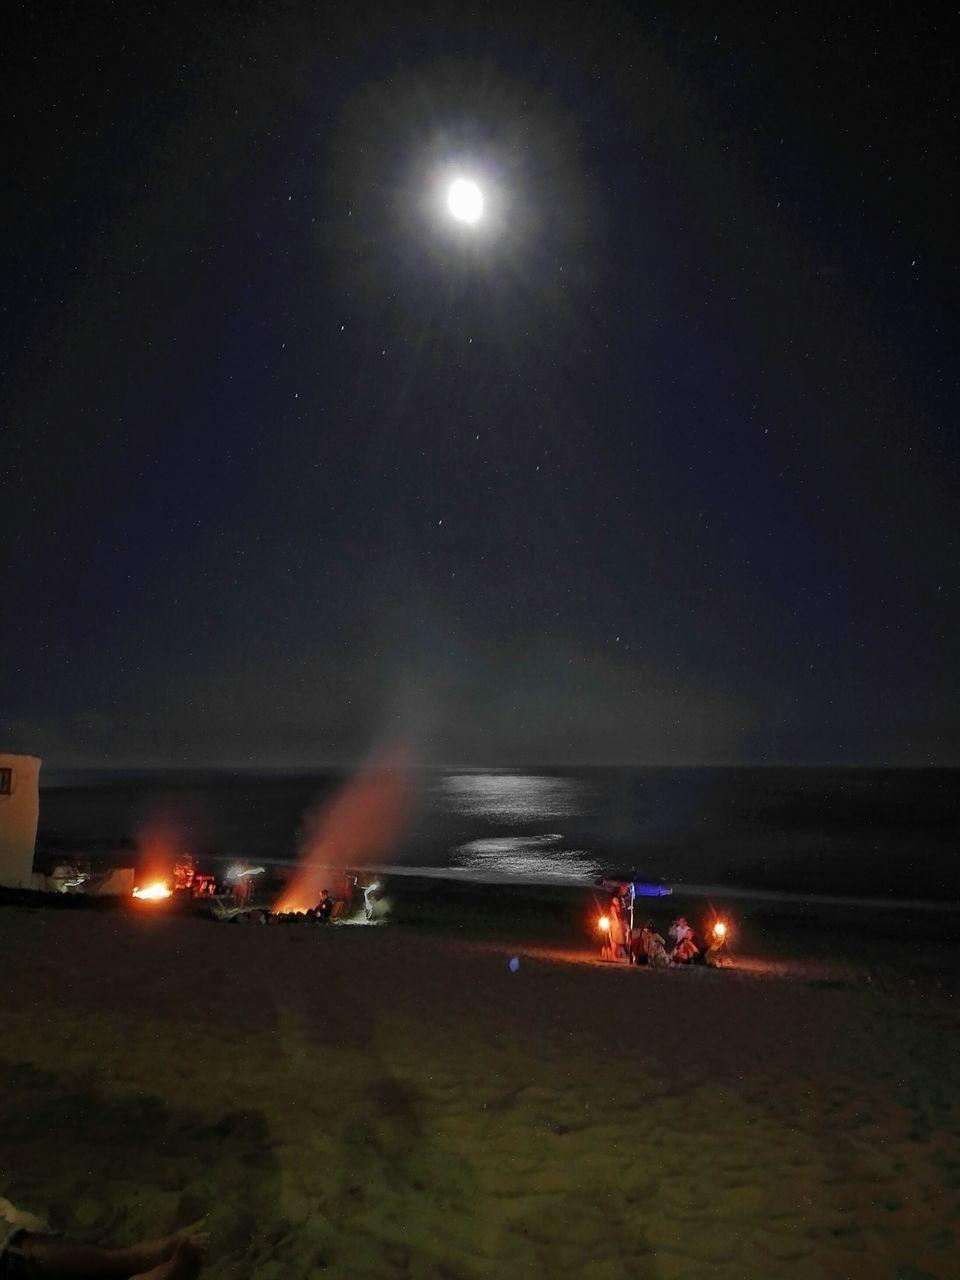 night, illuminated, burning, flame, outdoors, motion, sky, nature, no people